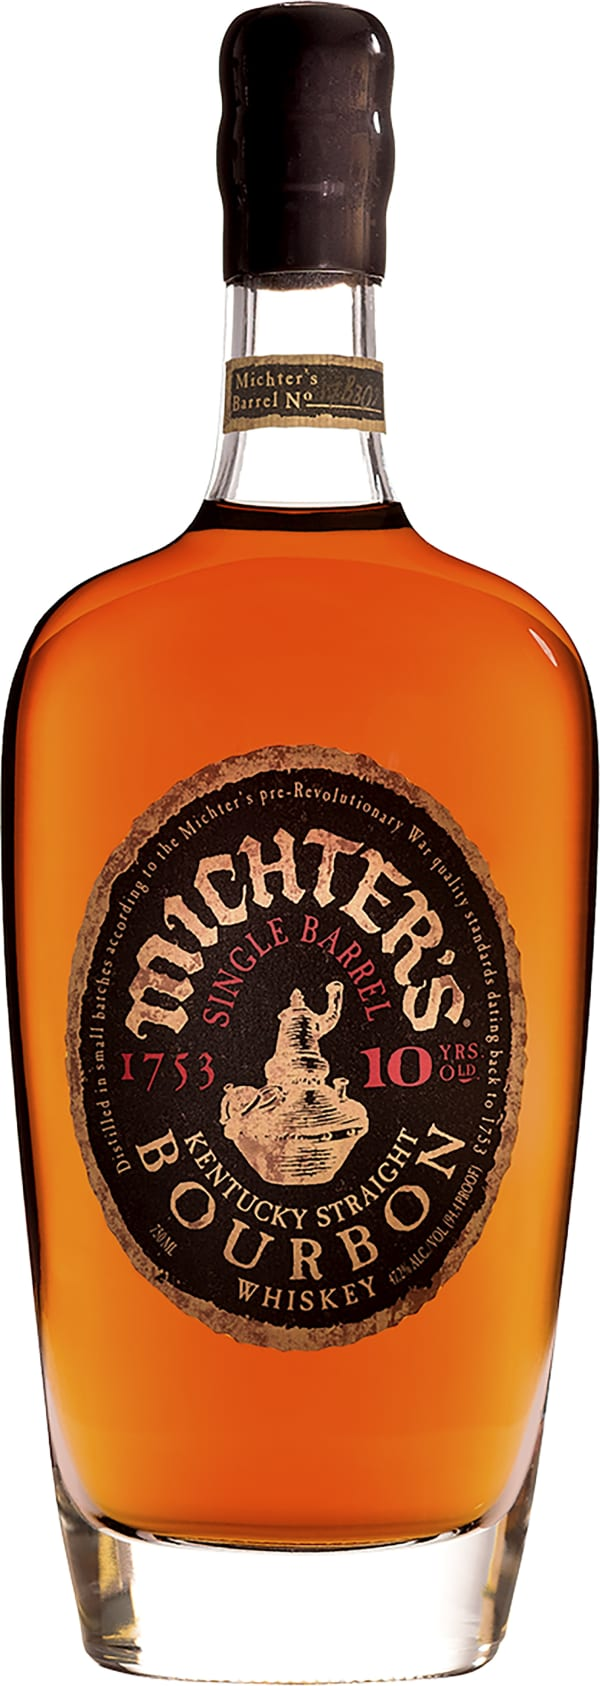 Michter's Single Barrel 10 Year Old Kentucky Straight Bourbon